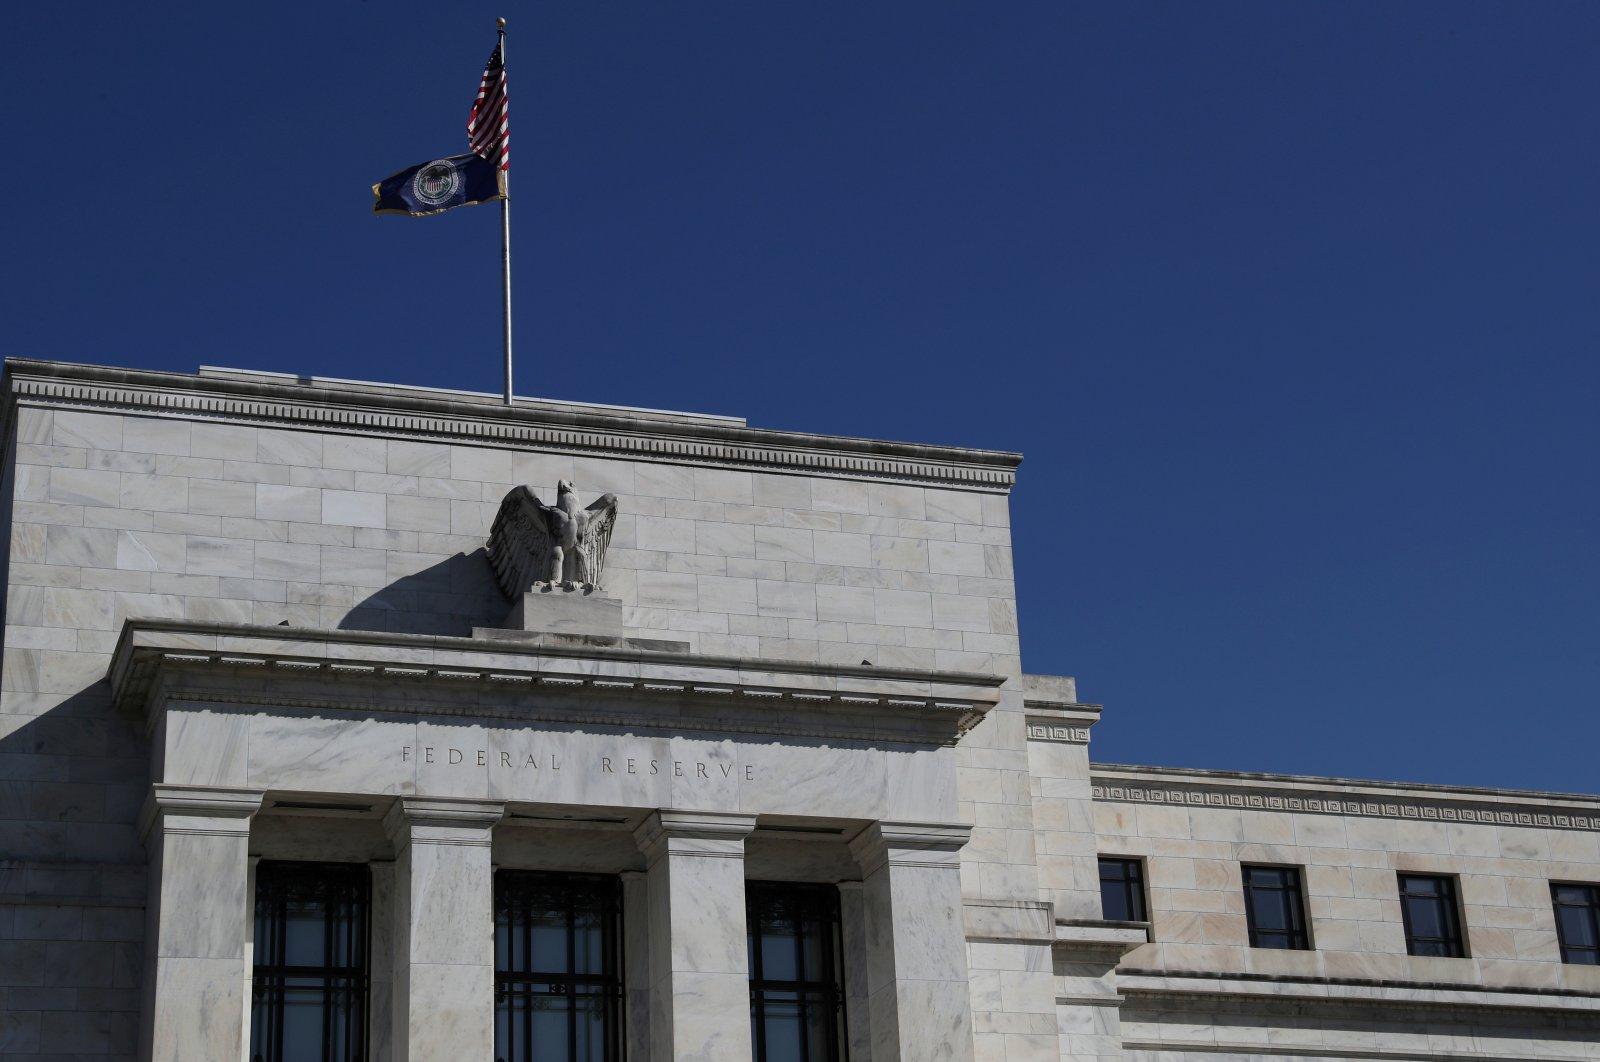 The U.S. Federal Reserve Board building on Constitution Avenue, Washington, D.C., U.S., March 19, 2019. (Reuters Photo)